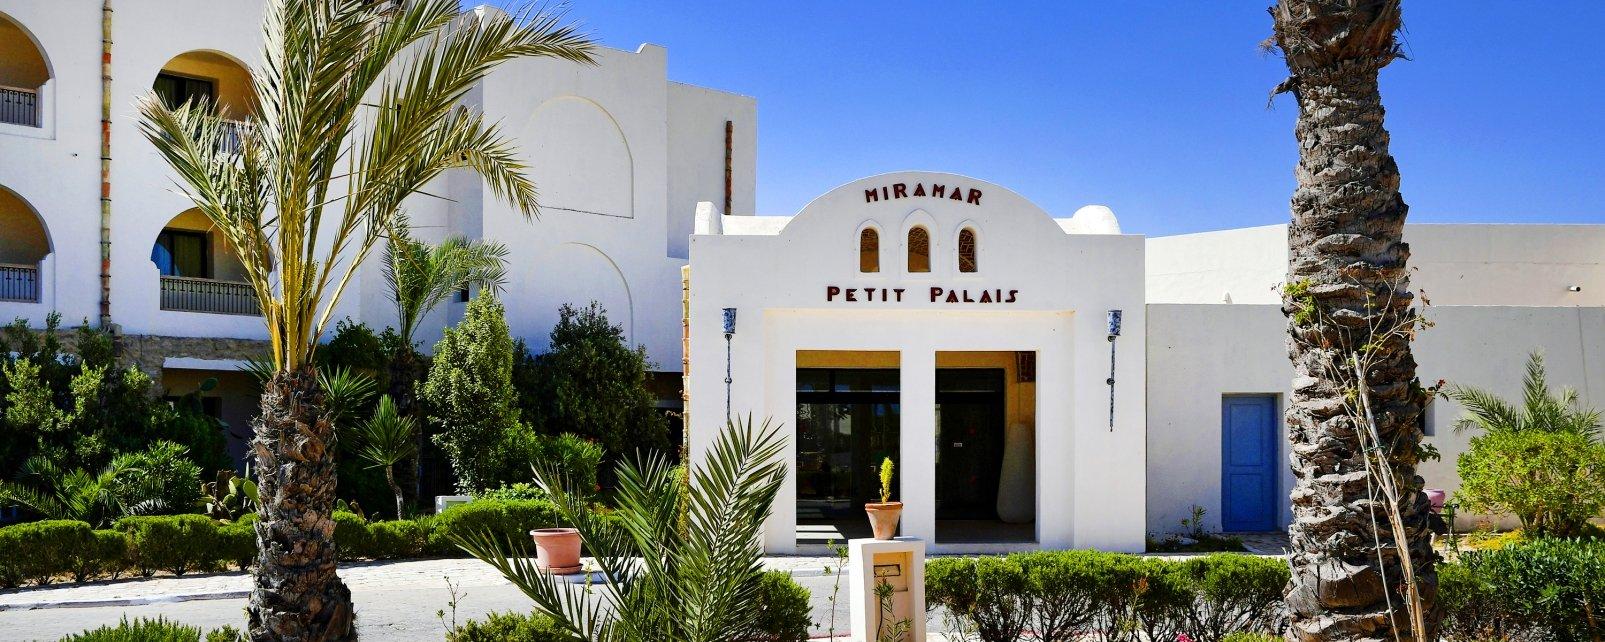 Hotel Miramar Le Petit Palais